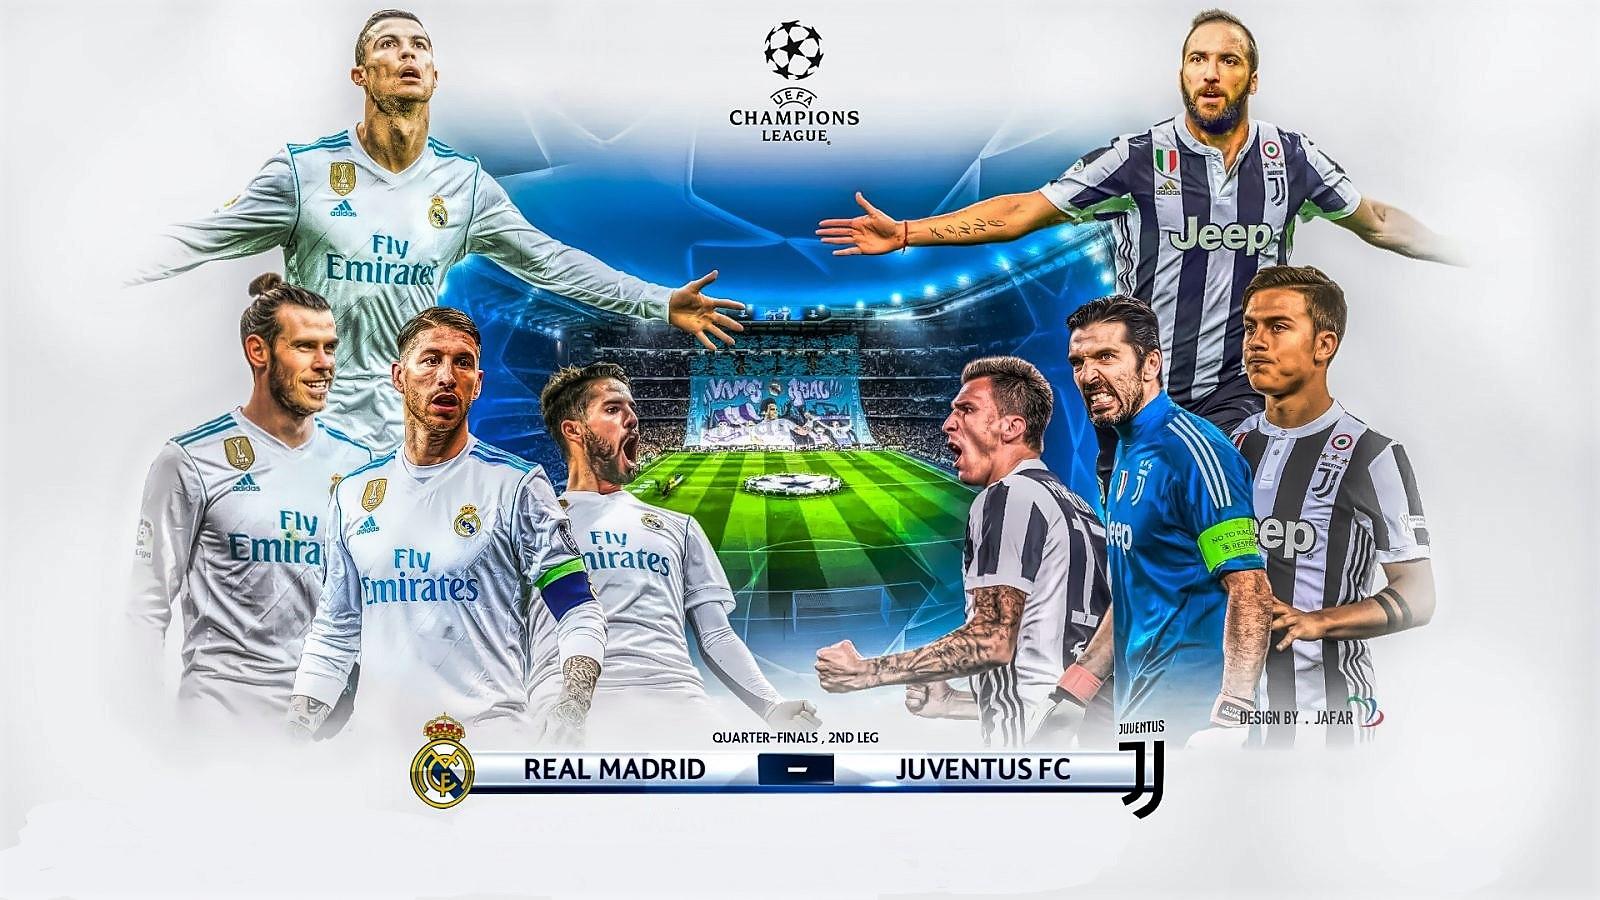 real_madrid_juventus_champions_league_2018-1600x900.jpg